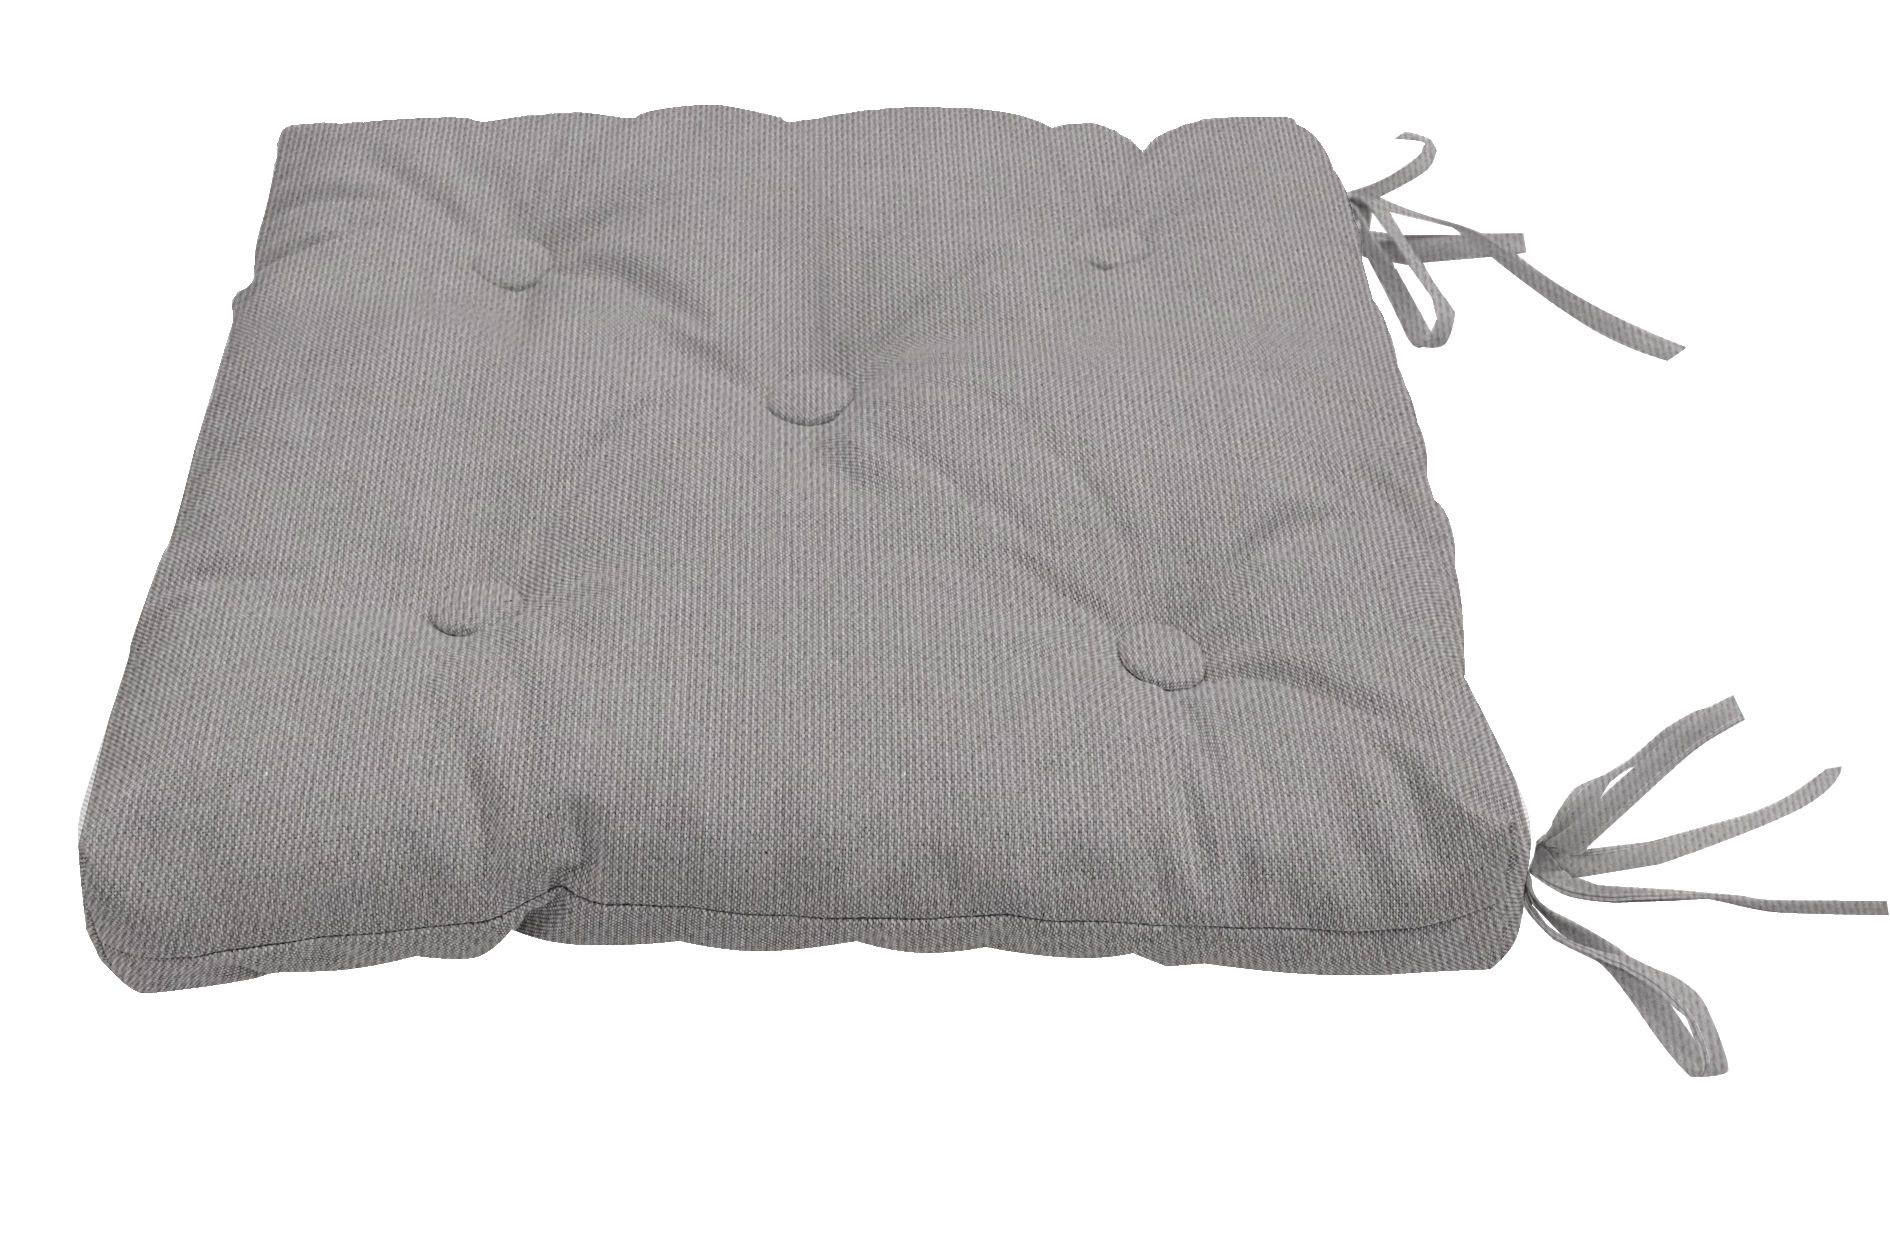 Подушки на стул Kauffort Подушка на стул Нosta Цвет: Серый (40х40) подушка на стул арти м райский сад